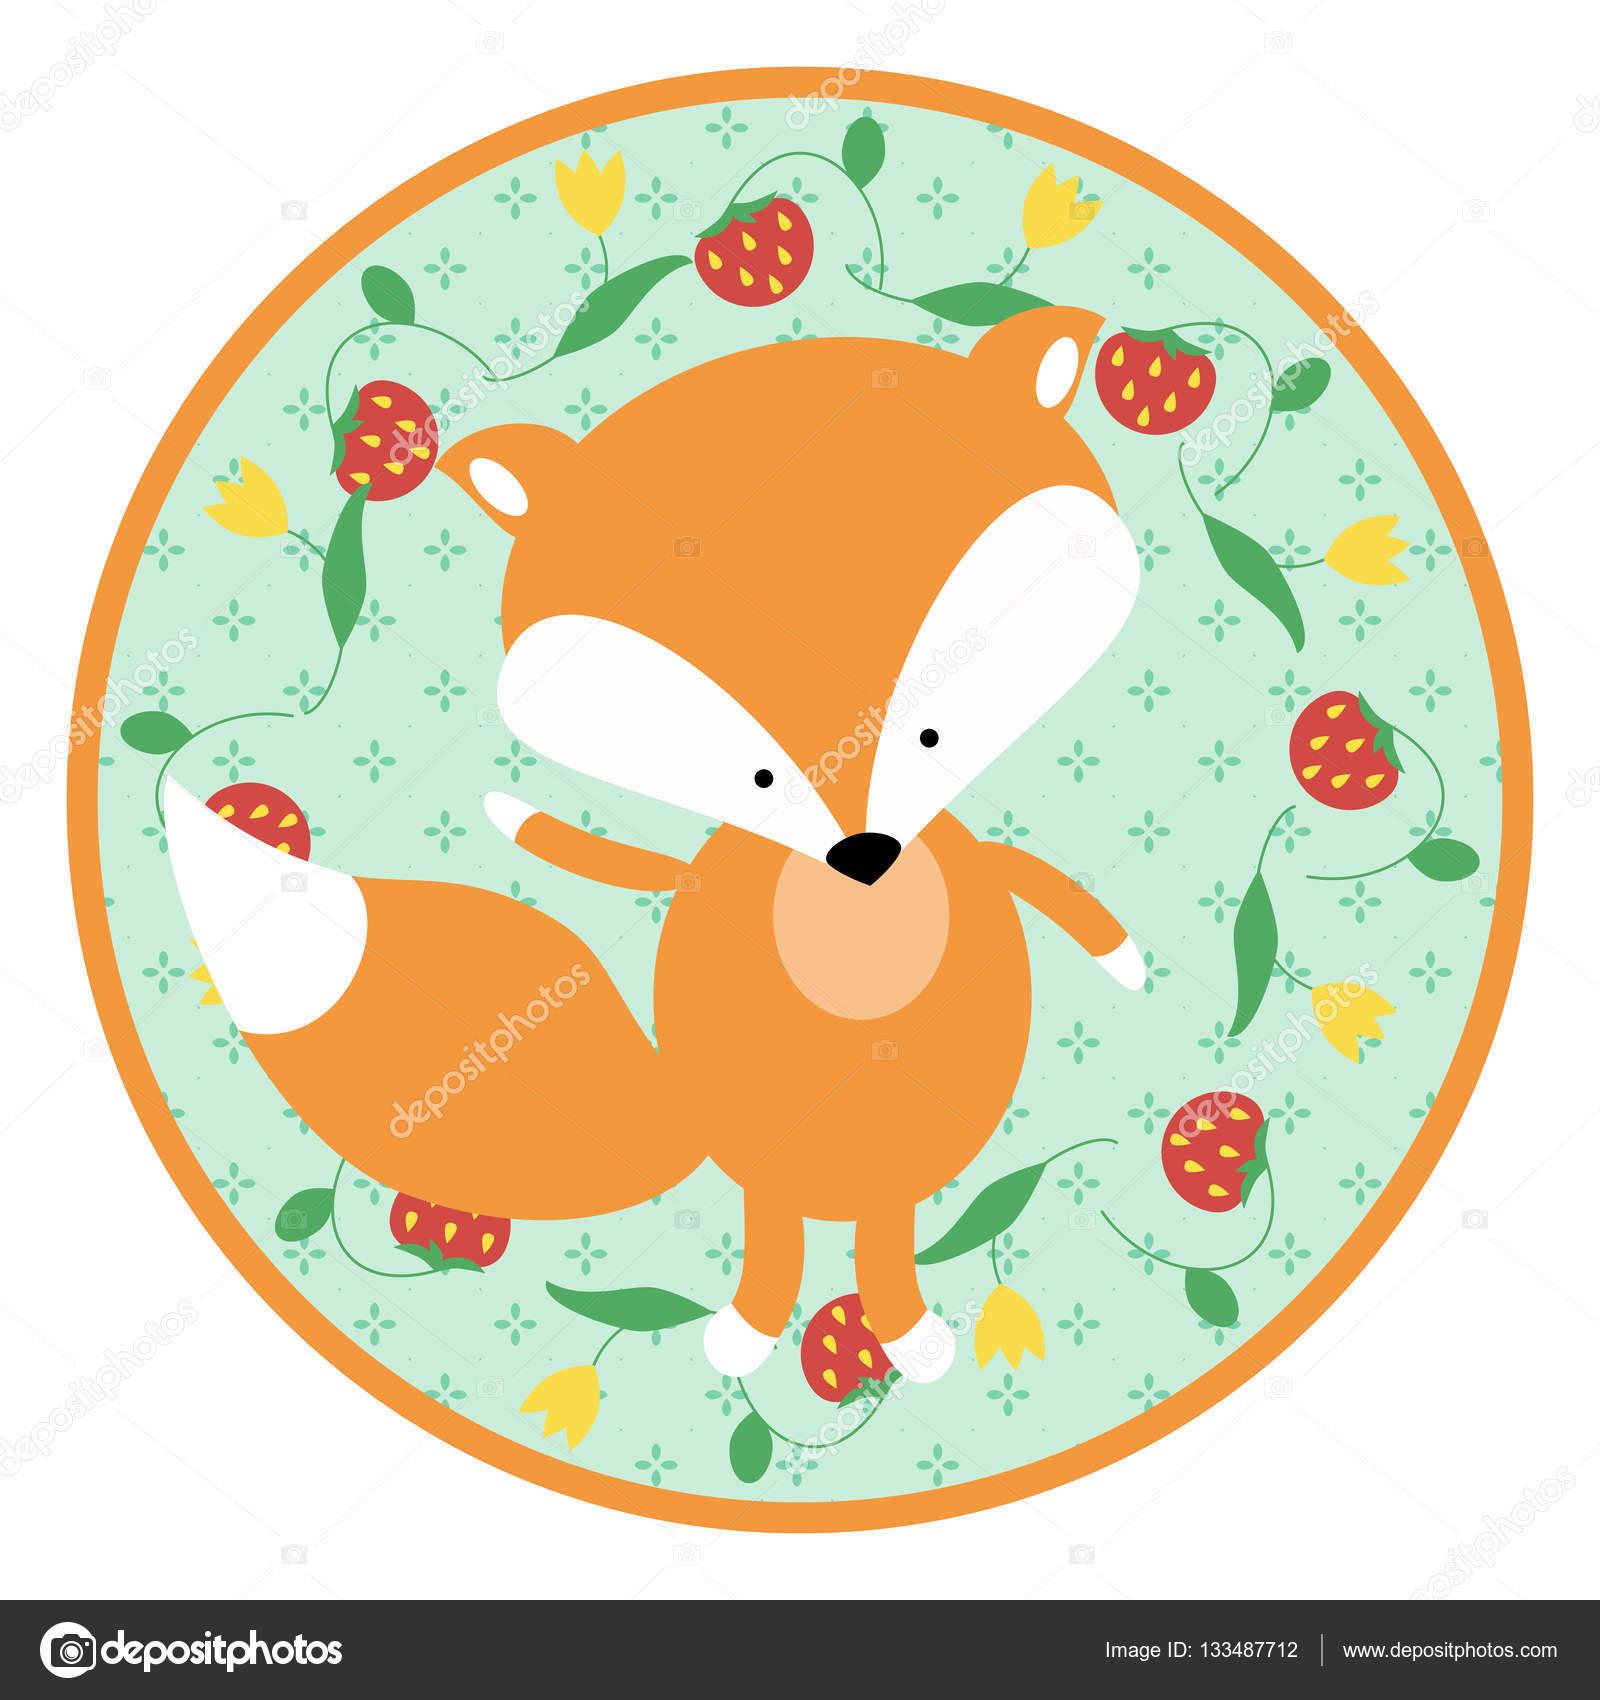 A cute little fox cub on a circular green background cartoon a cute little fox cub on a circular green background cartoon animal design for baby voltagebd Images